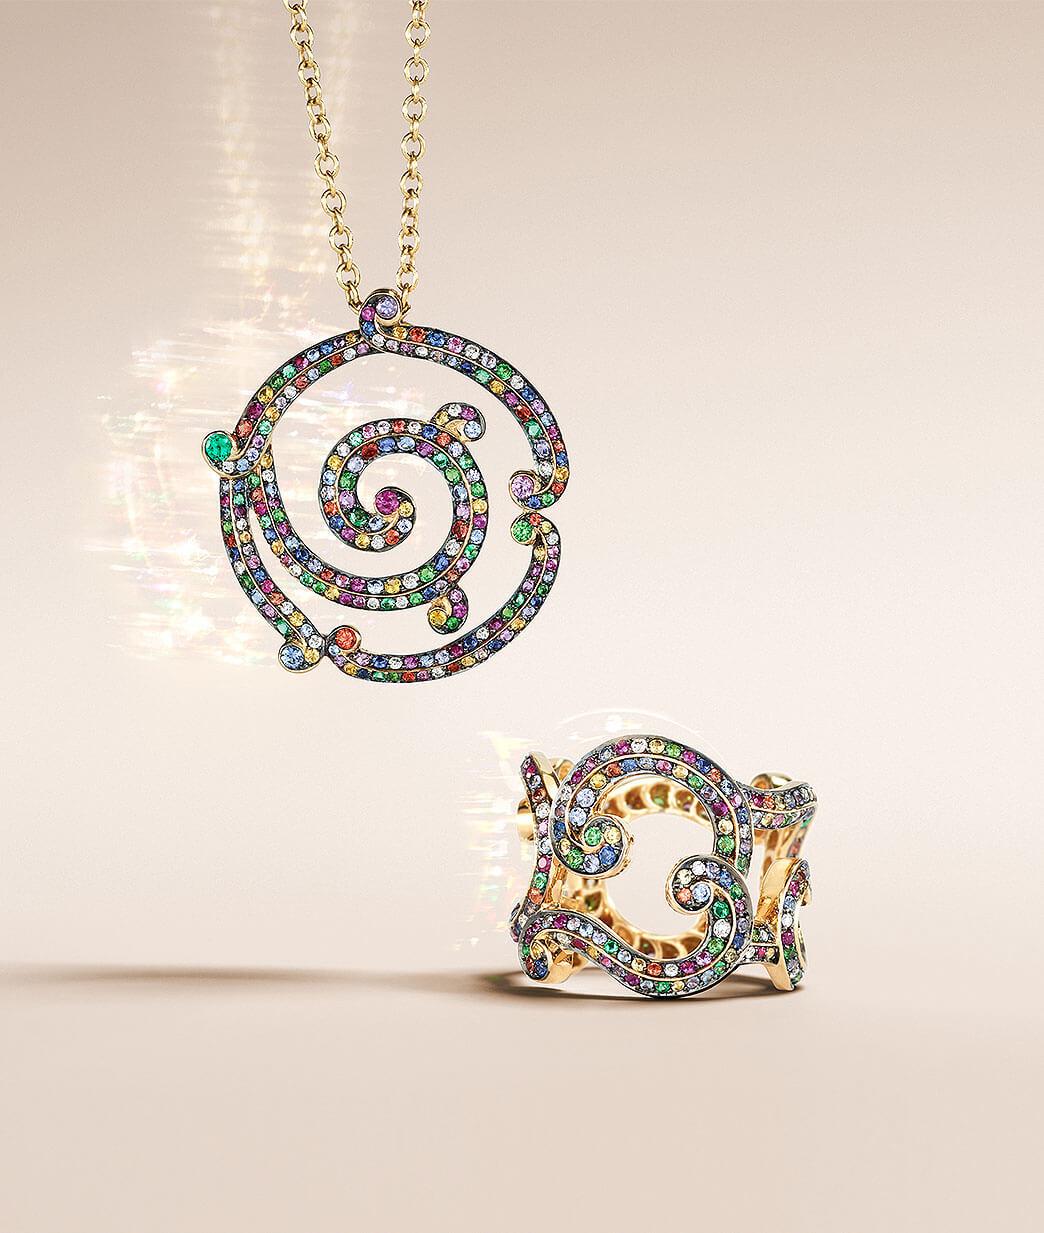 Fabergé quadrille pendant with white diamonds and blue sapphires